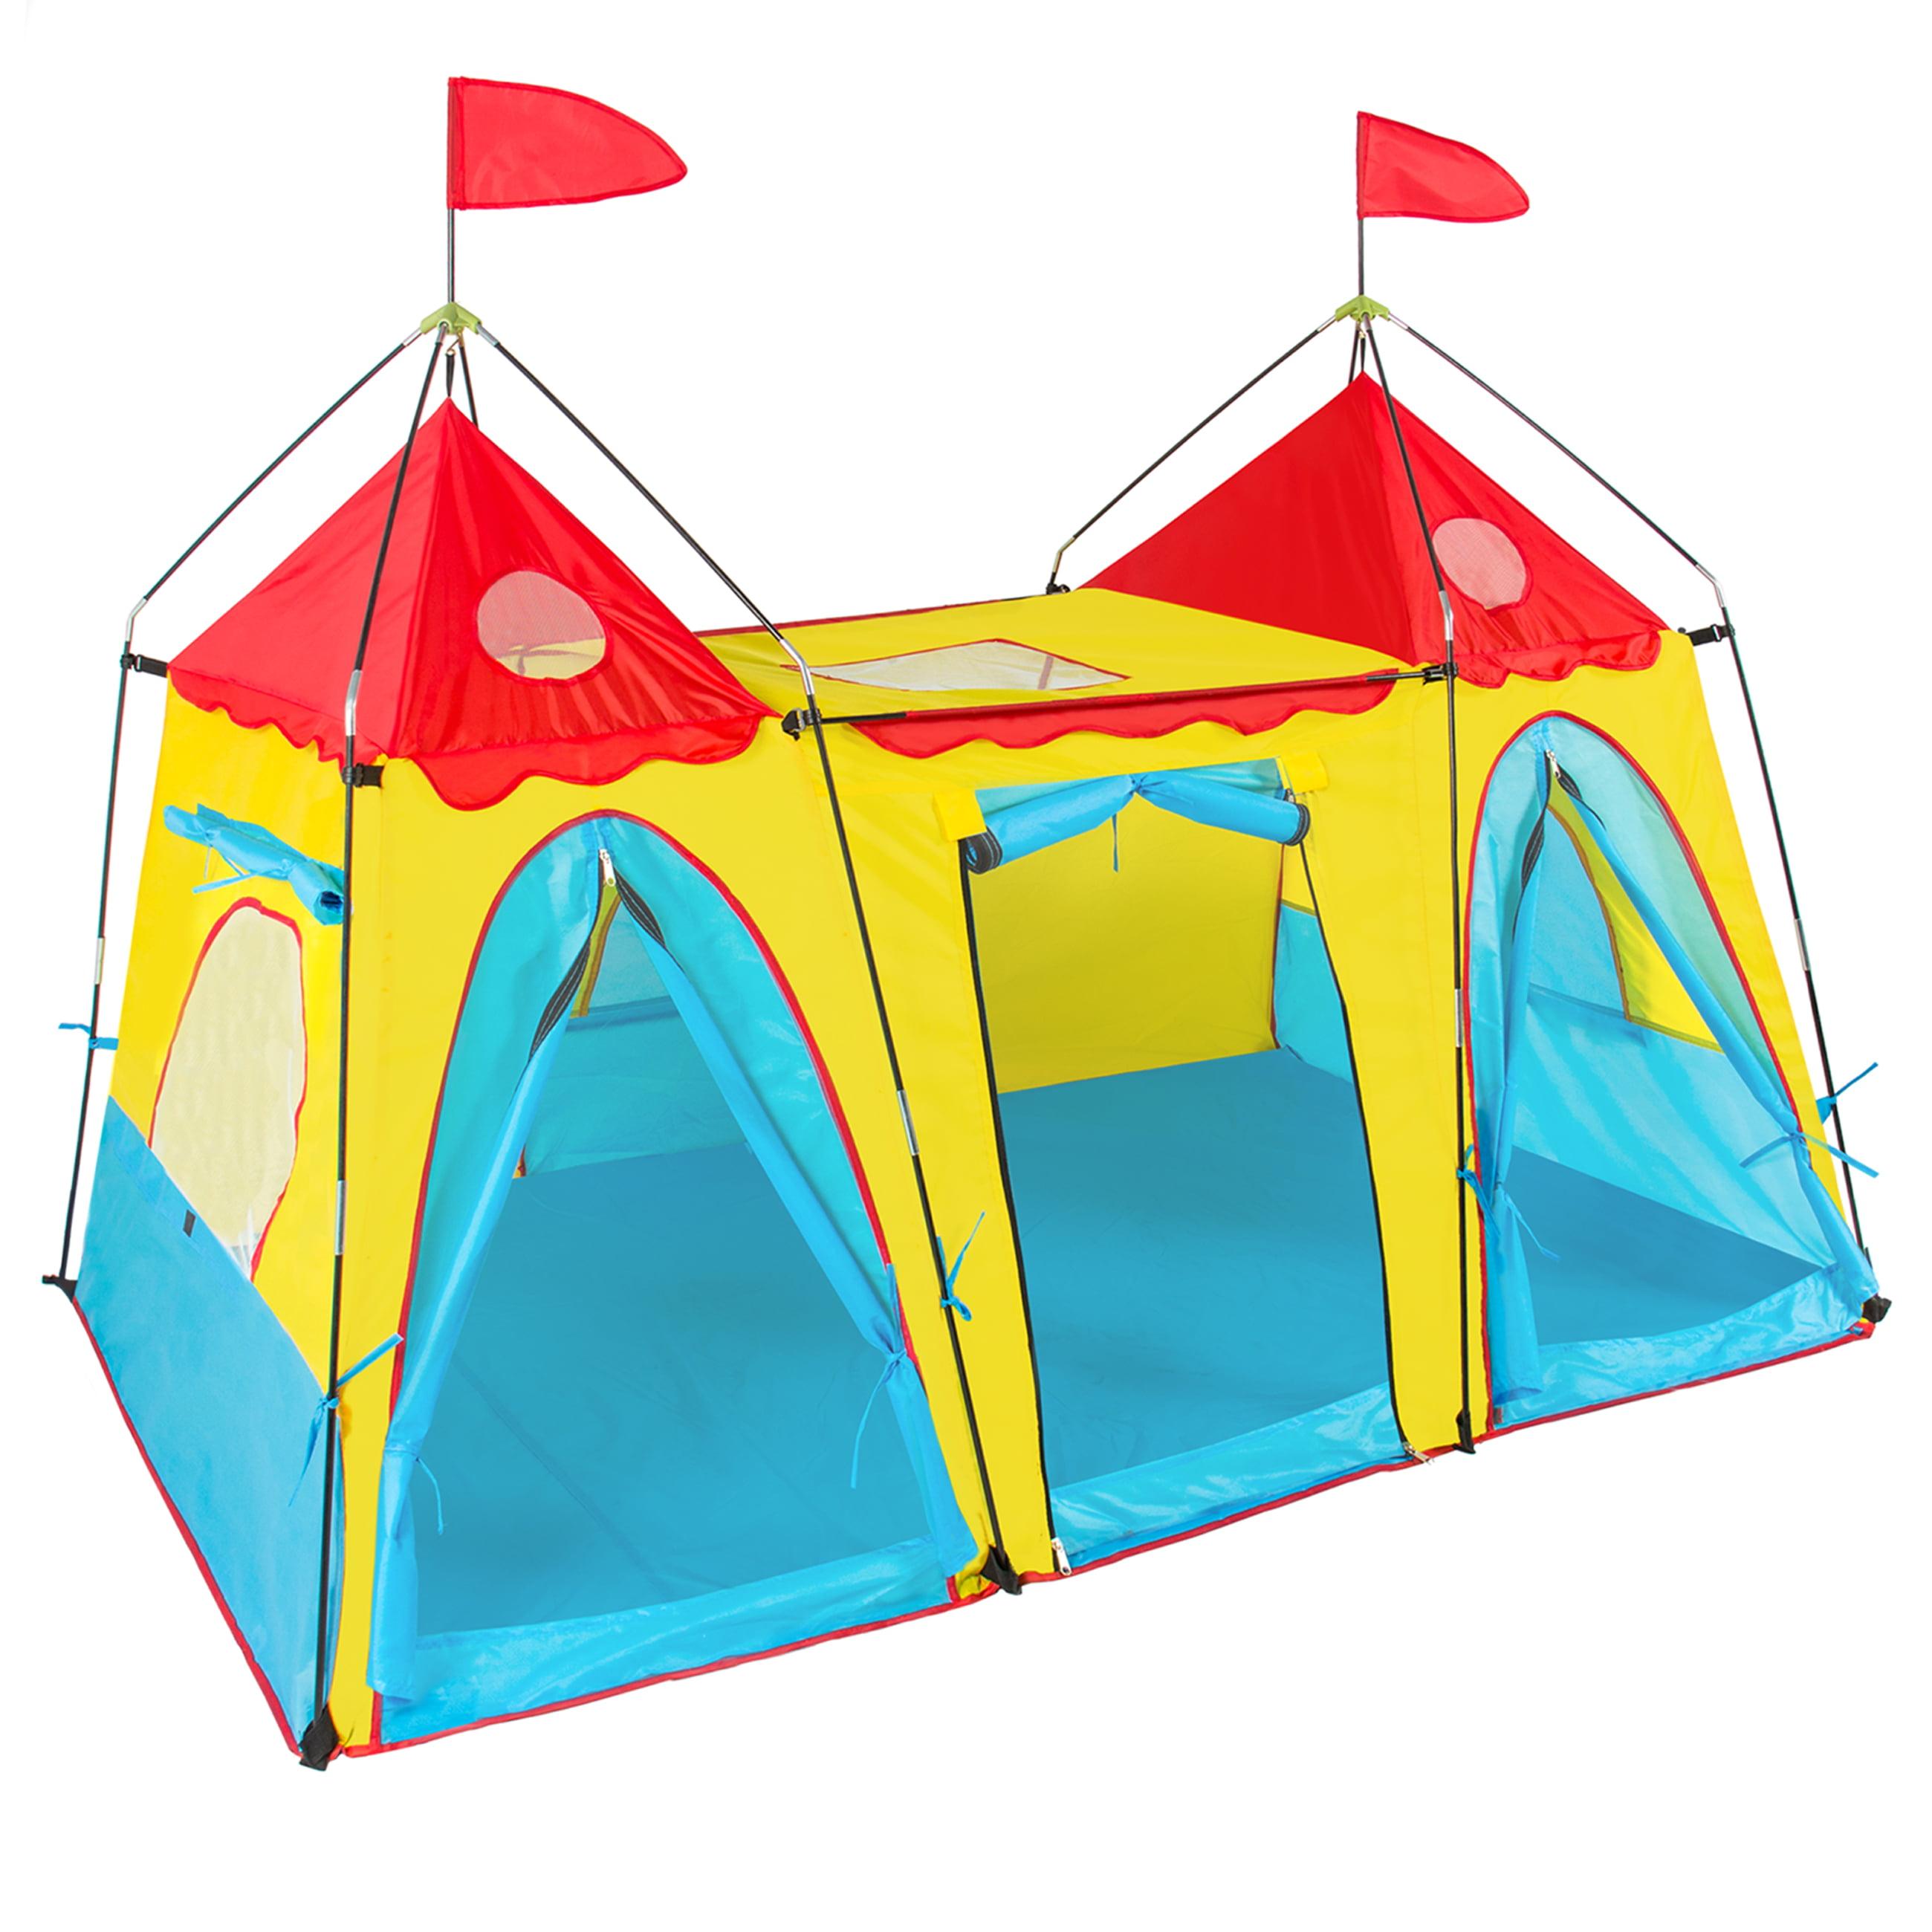 Kidu0027s Play Tent Big Girl Indoor Outdoor Fantasy Palace Castle Easy Set Up House - Walmart.com  sc 1 st  Walmart & Kidu0027s Play Tent Big Girl Indoor Outdoor Fantasy Palace Castle Easy ...